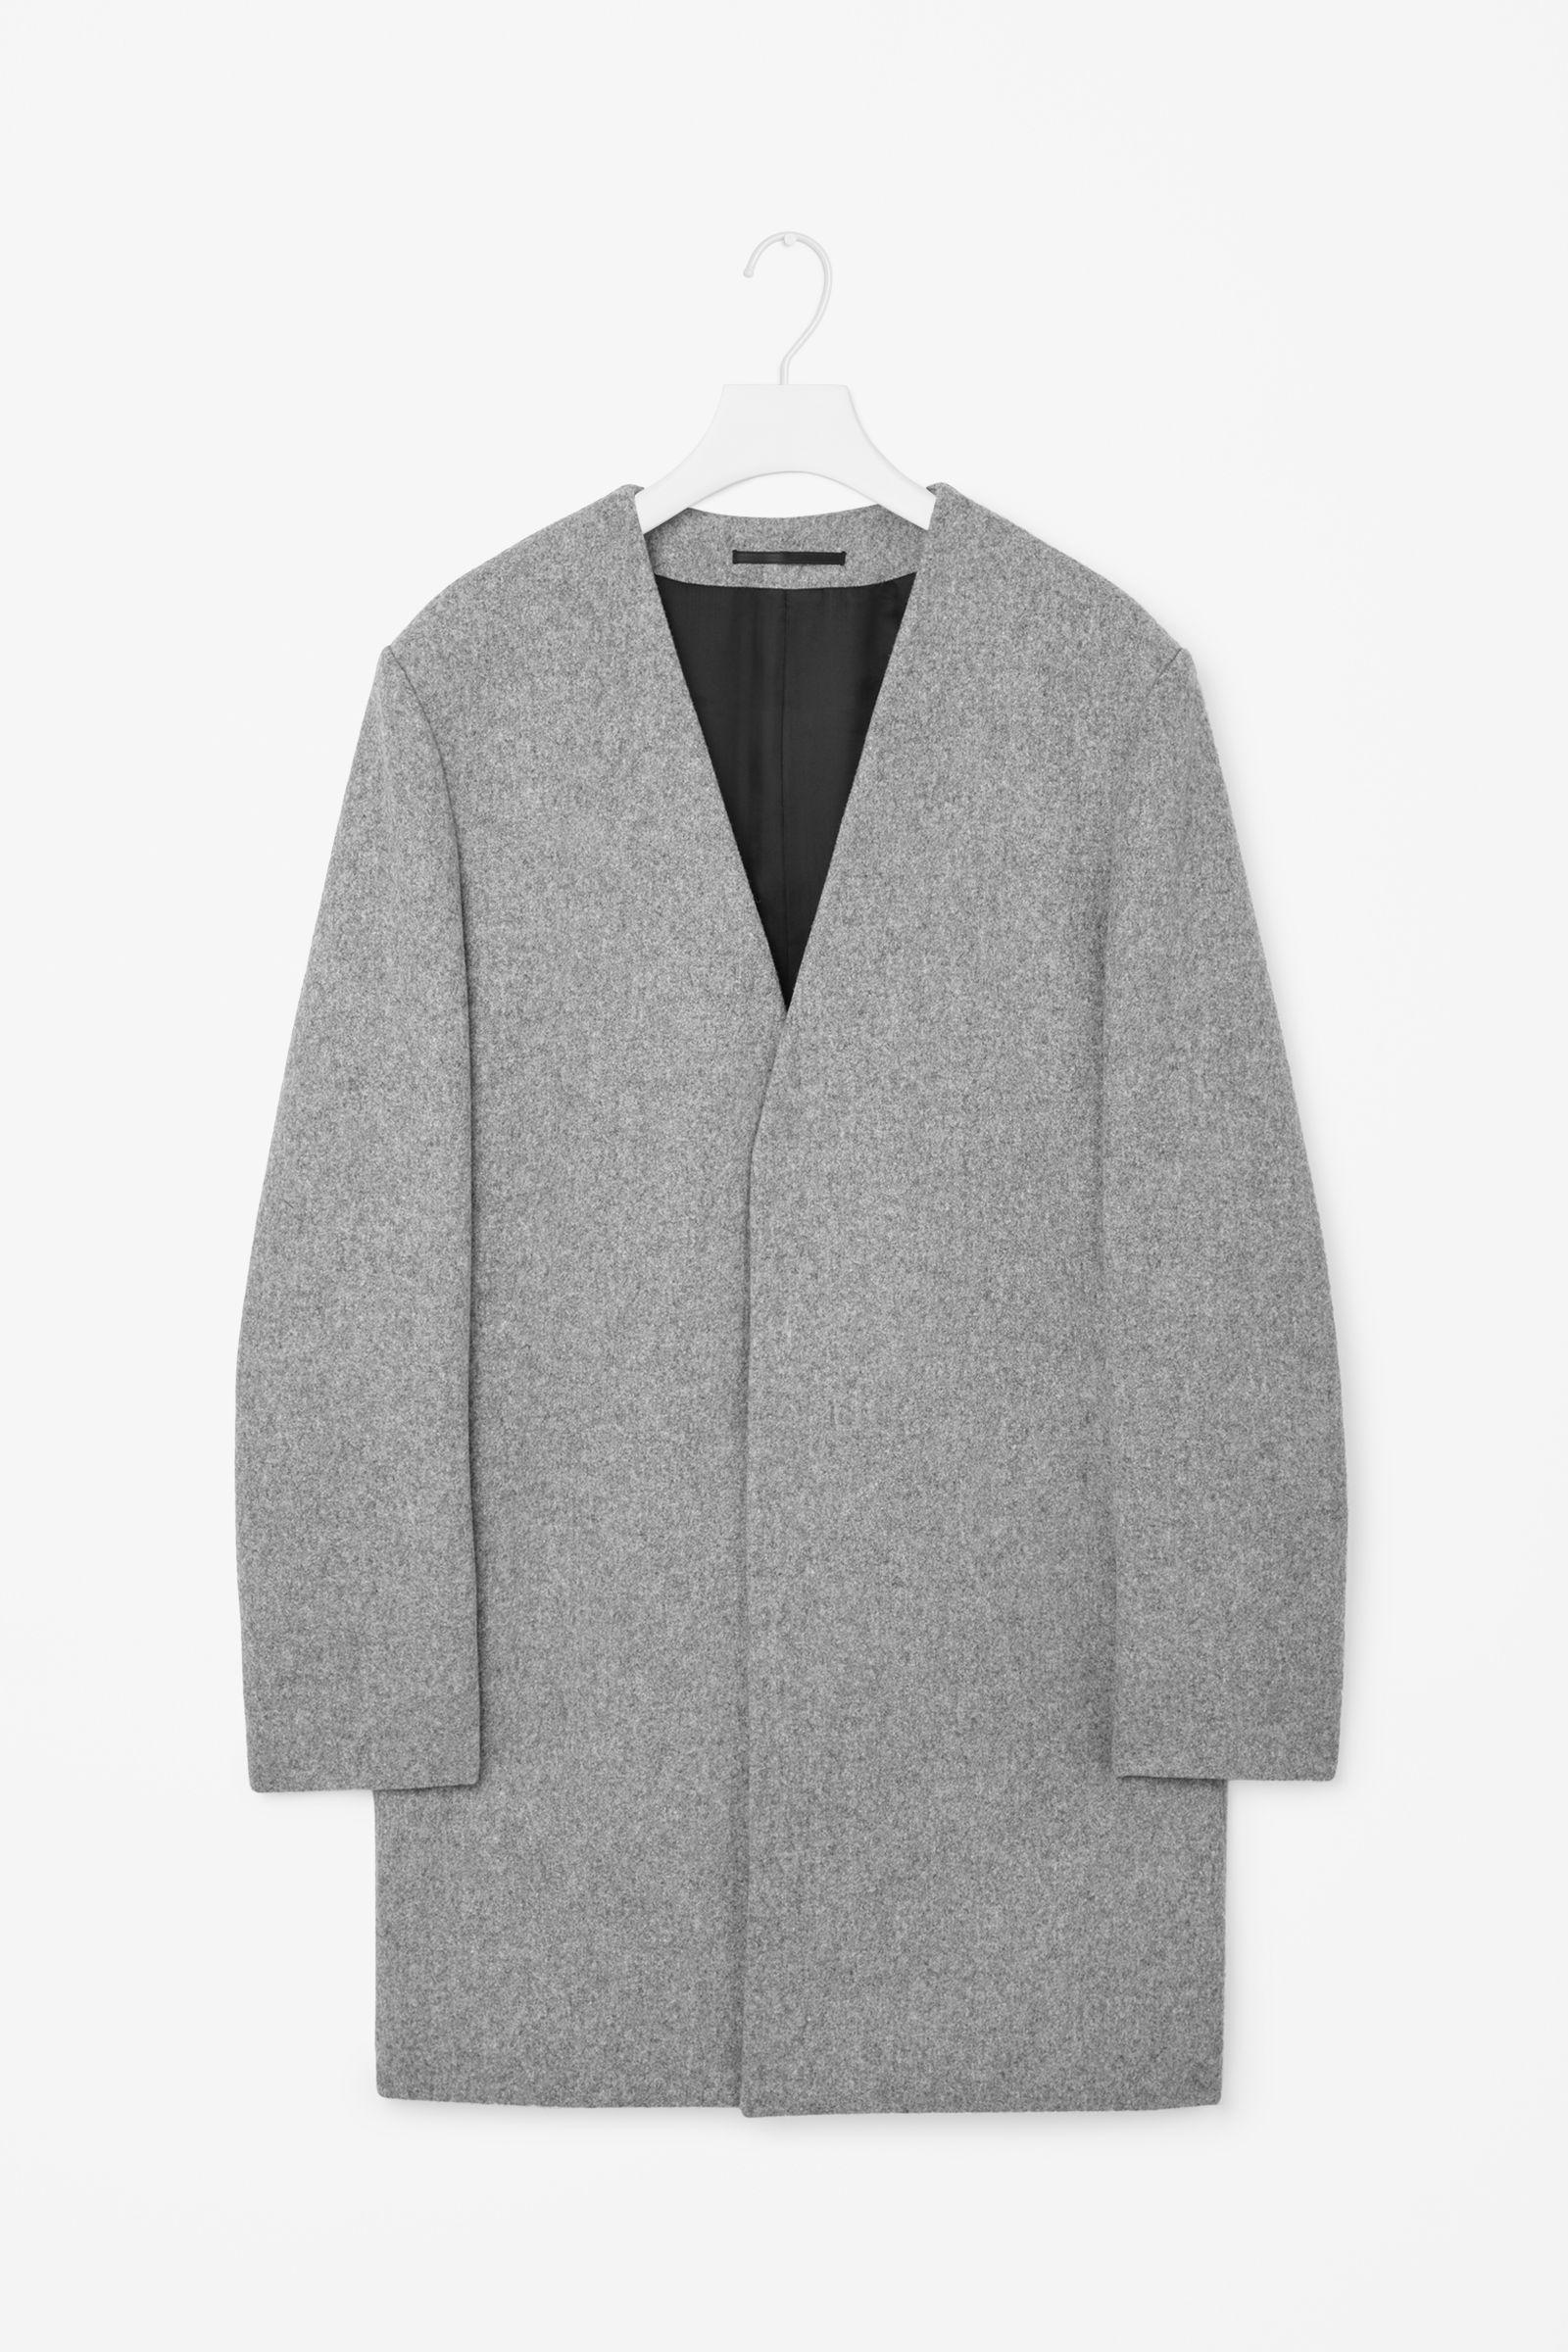 Wool Coat Wool Coat FashionCoatFashion CosCollarless Outfits CosCollarless CosCollarless Outfits Wool FashionCoatFashion Coat D2EIWH9Y